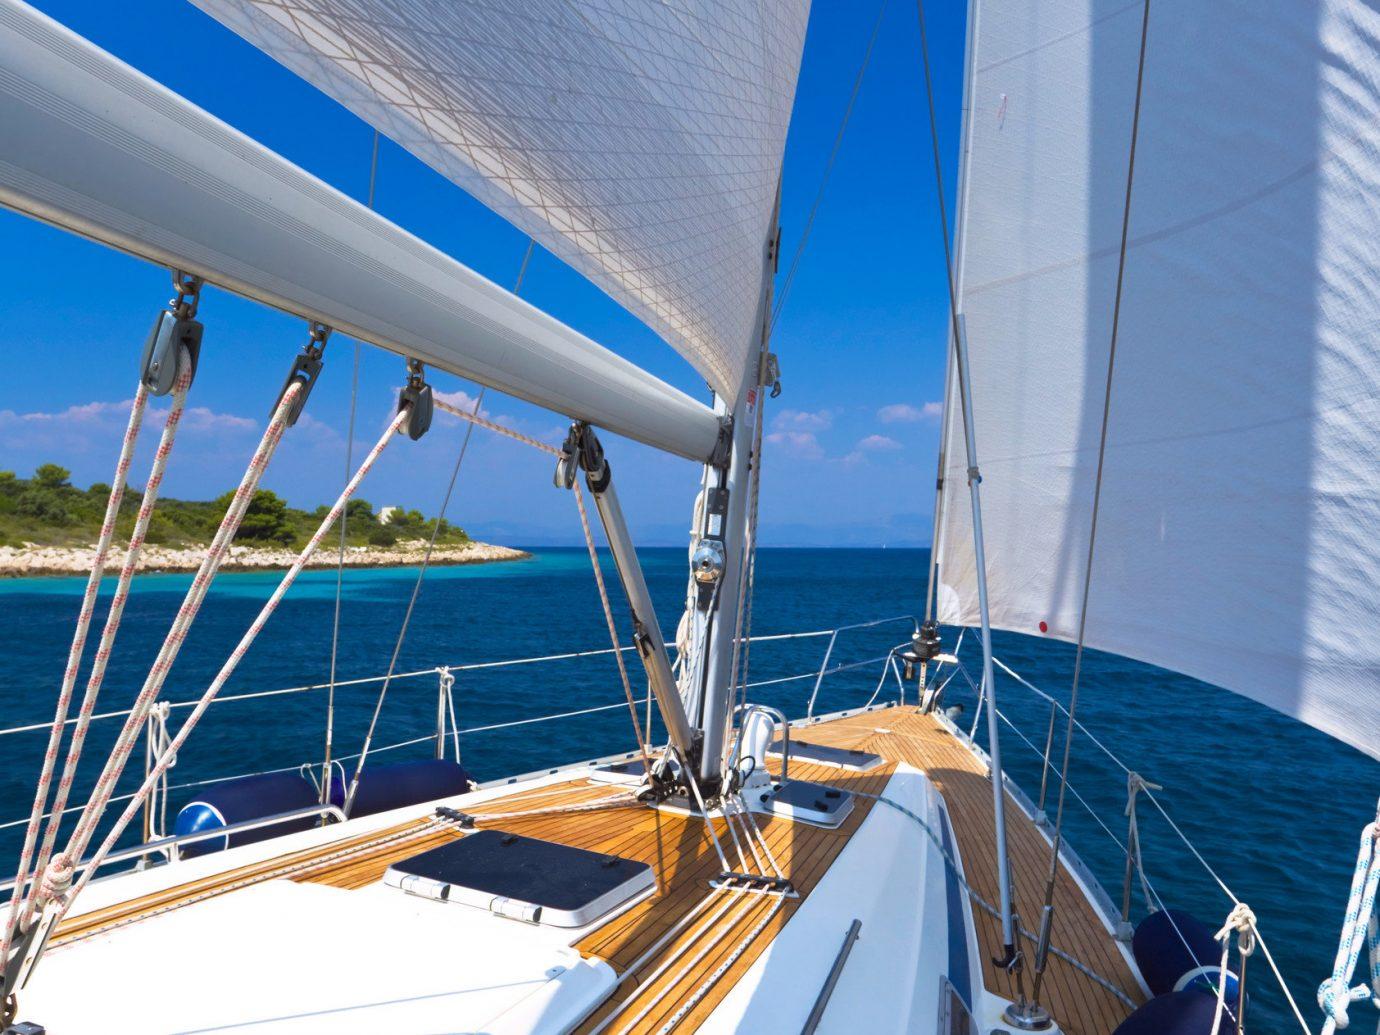 Offbeat sky Boat outdoor water sail vehicle sailboat watercraft sailing ship sailing vessel yacht ship transport mast passenger ship Sea sports sailing blue windsports docked